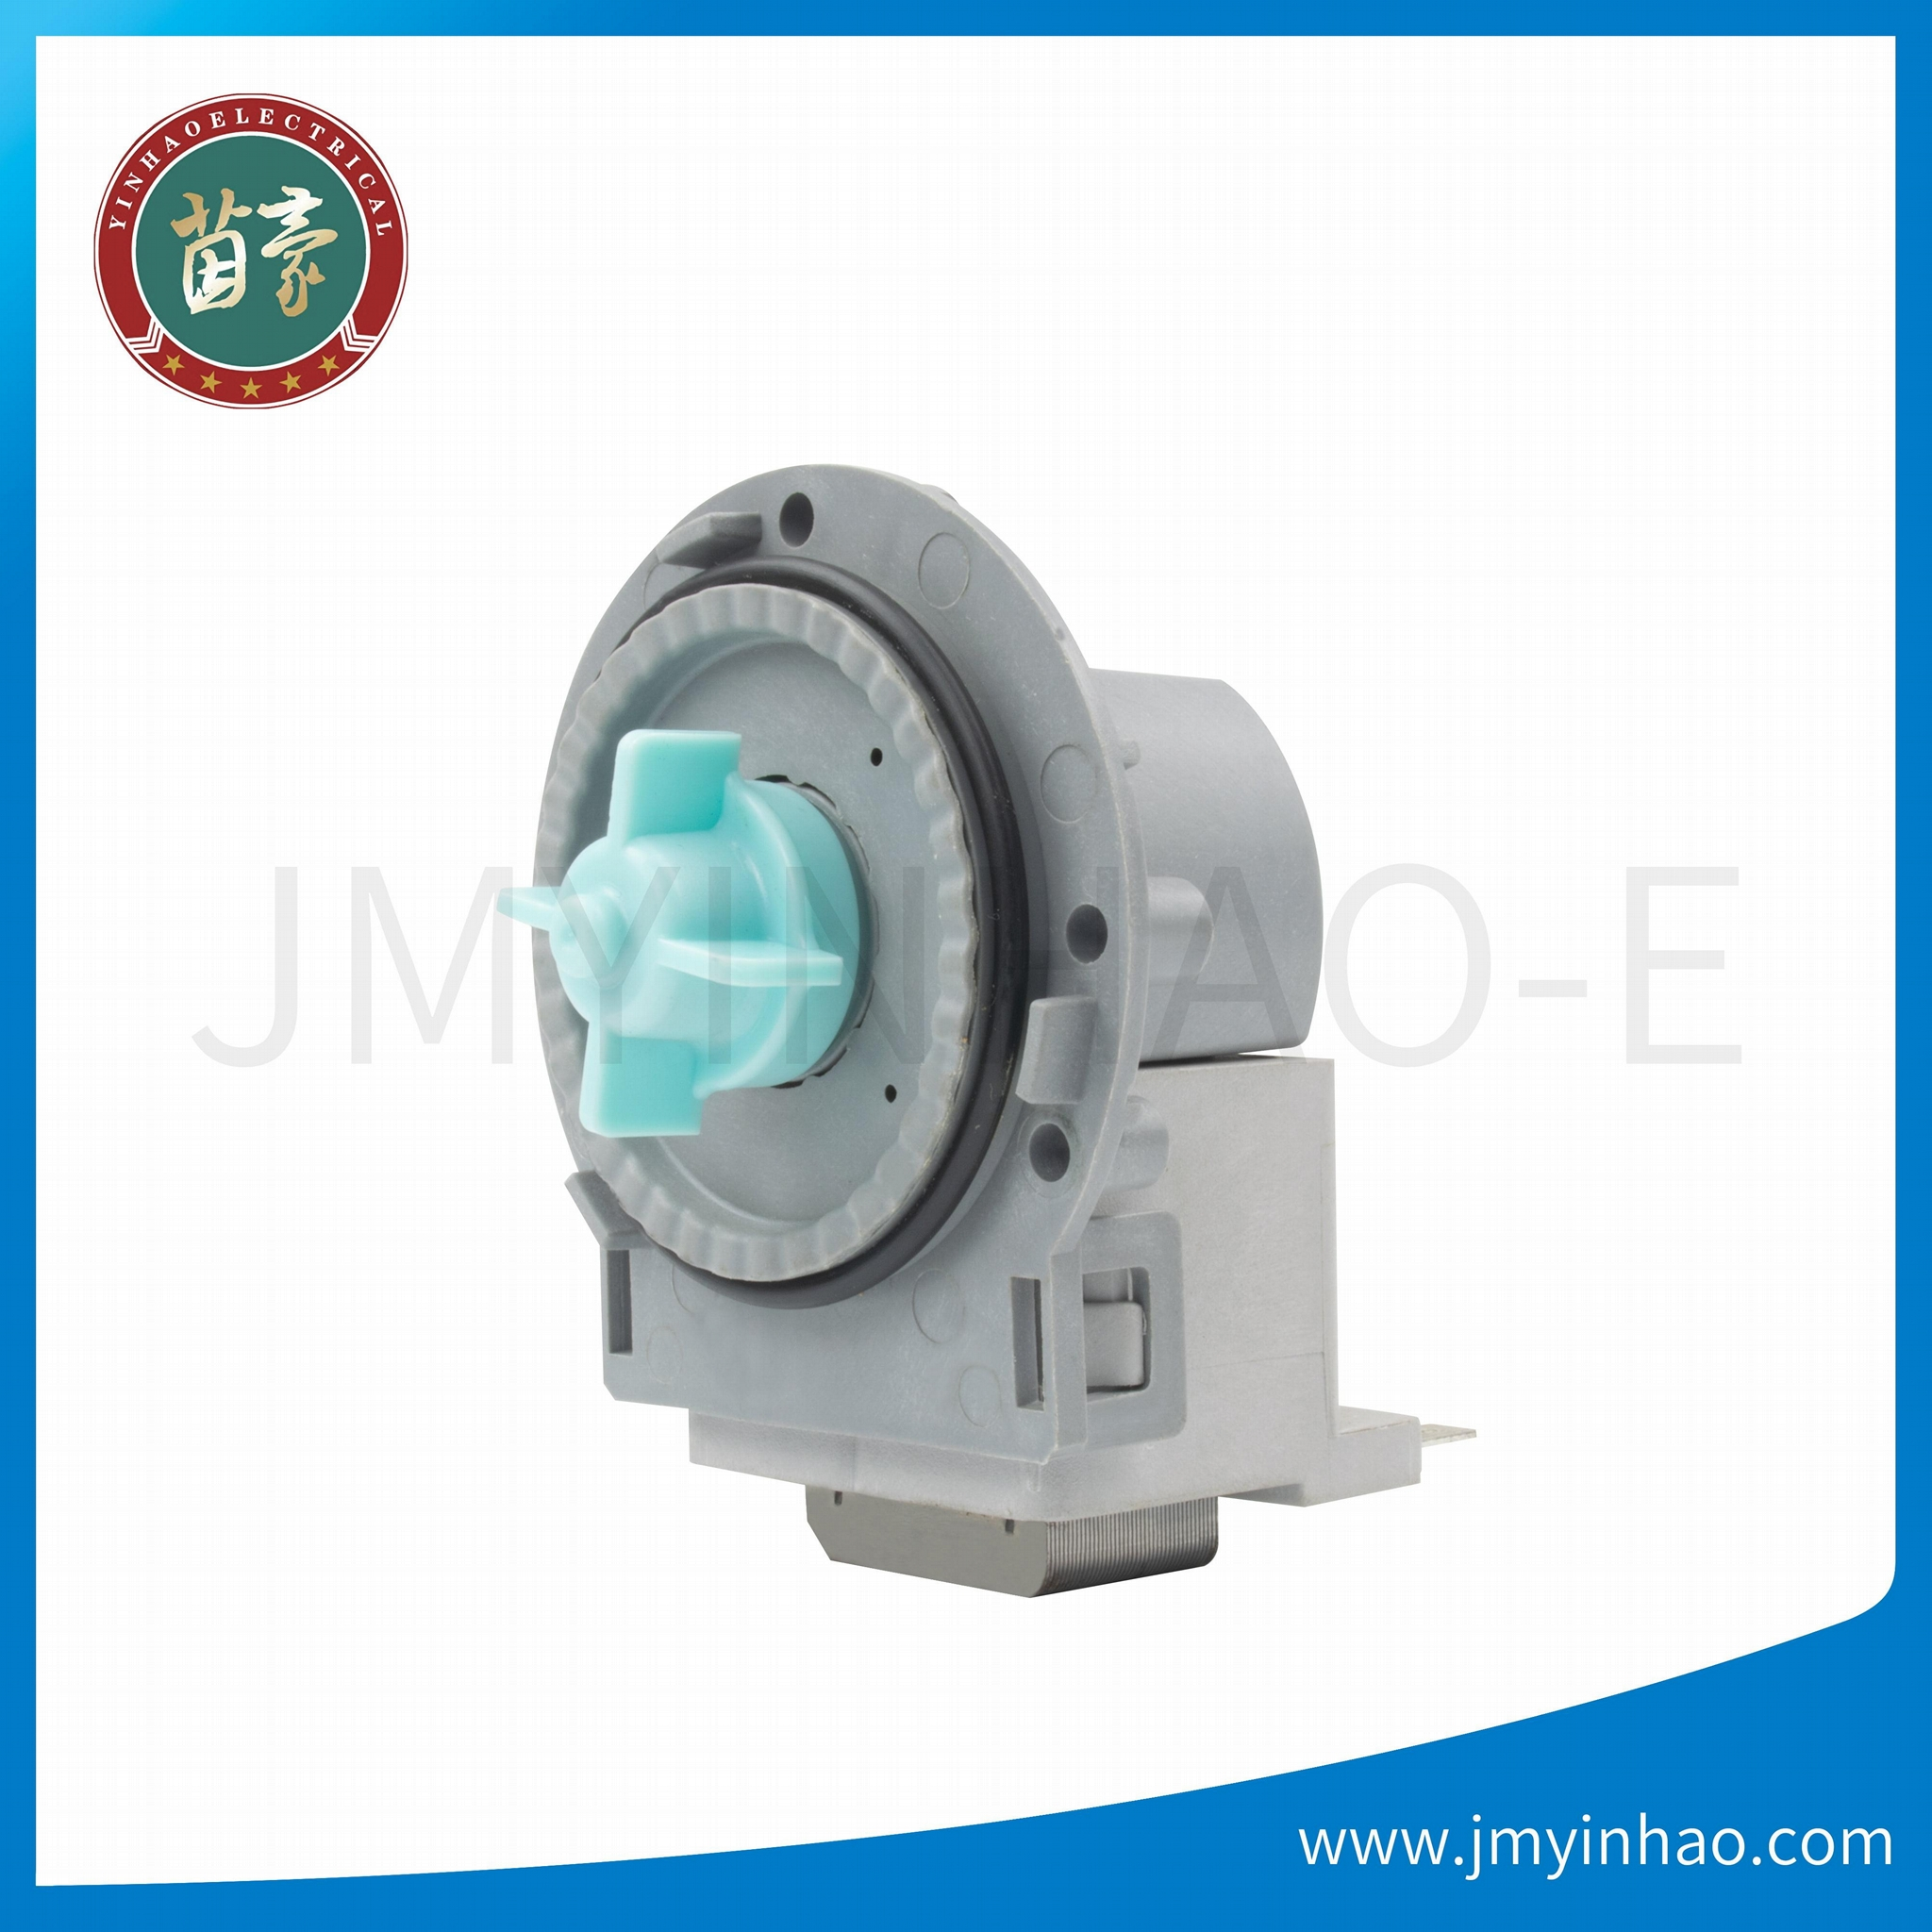 washing machine spare parts/drain pump motor 1